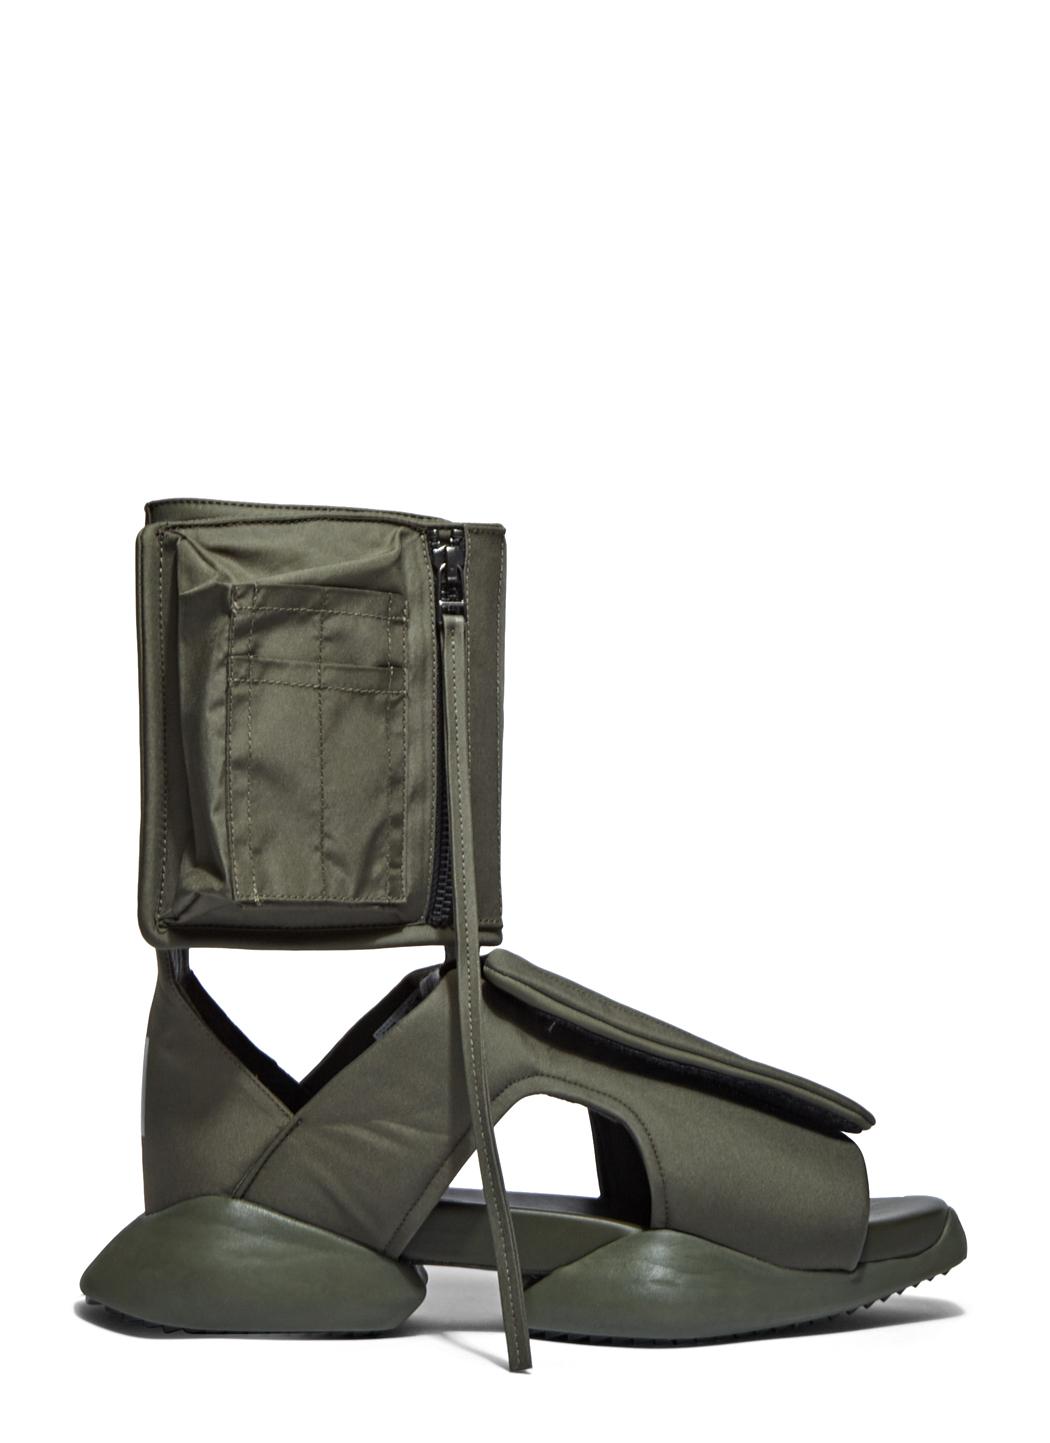 bfbd32b008ab1 Lyst - Rick Owens X Adidas Men s Velcro Strap Ro Cargo Sandals In ...